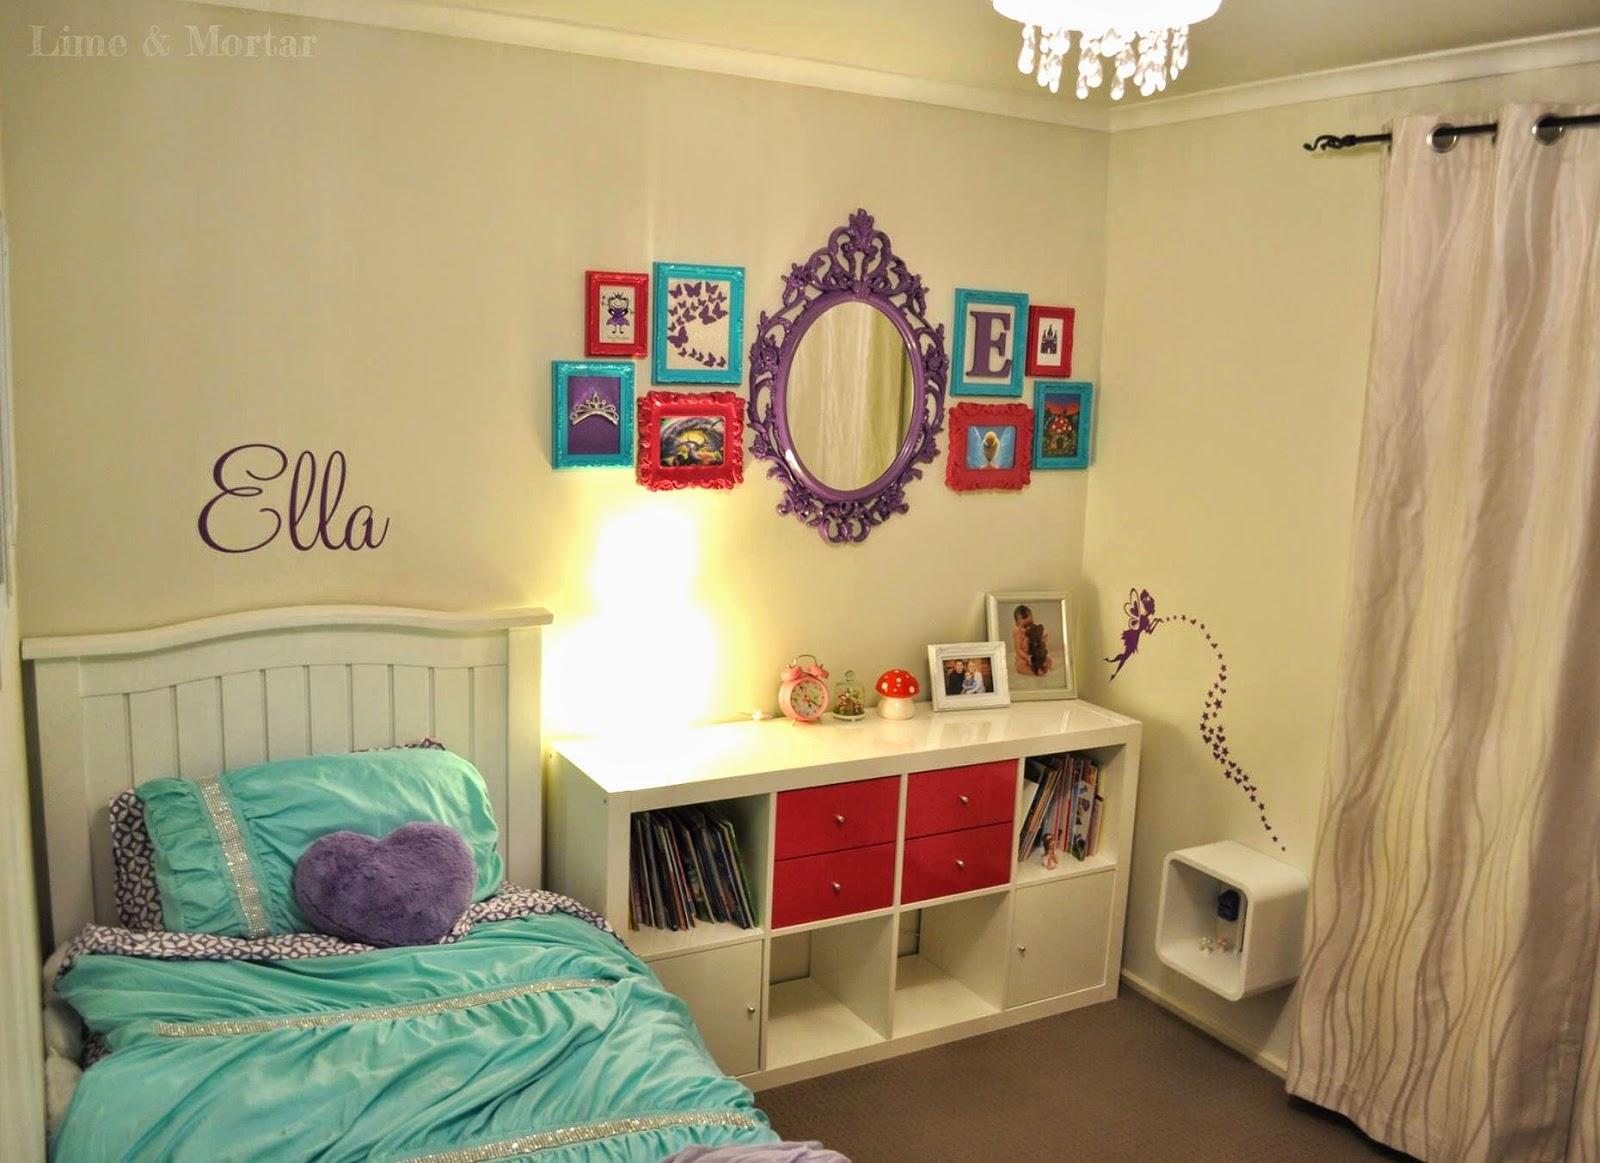 Readeru0027s Room: Fairy Bedroom